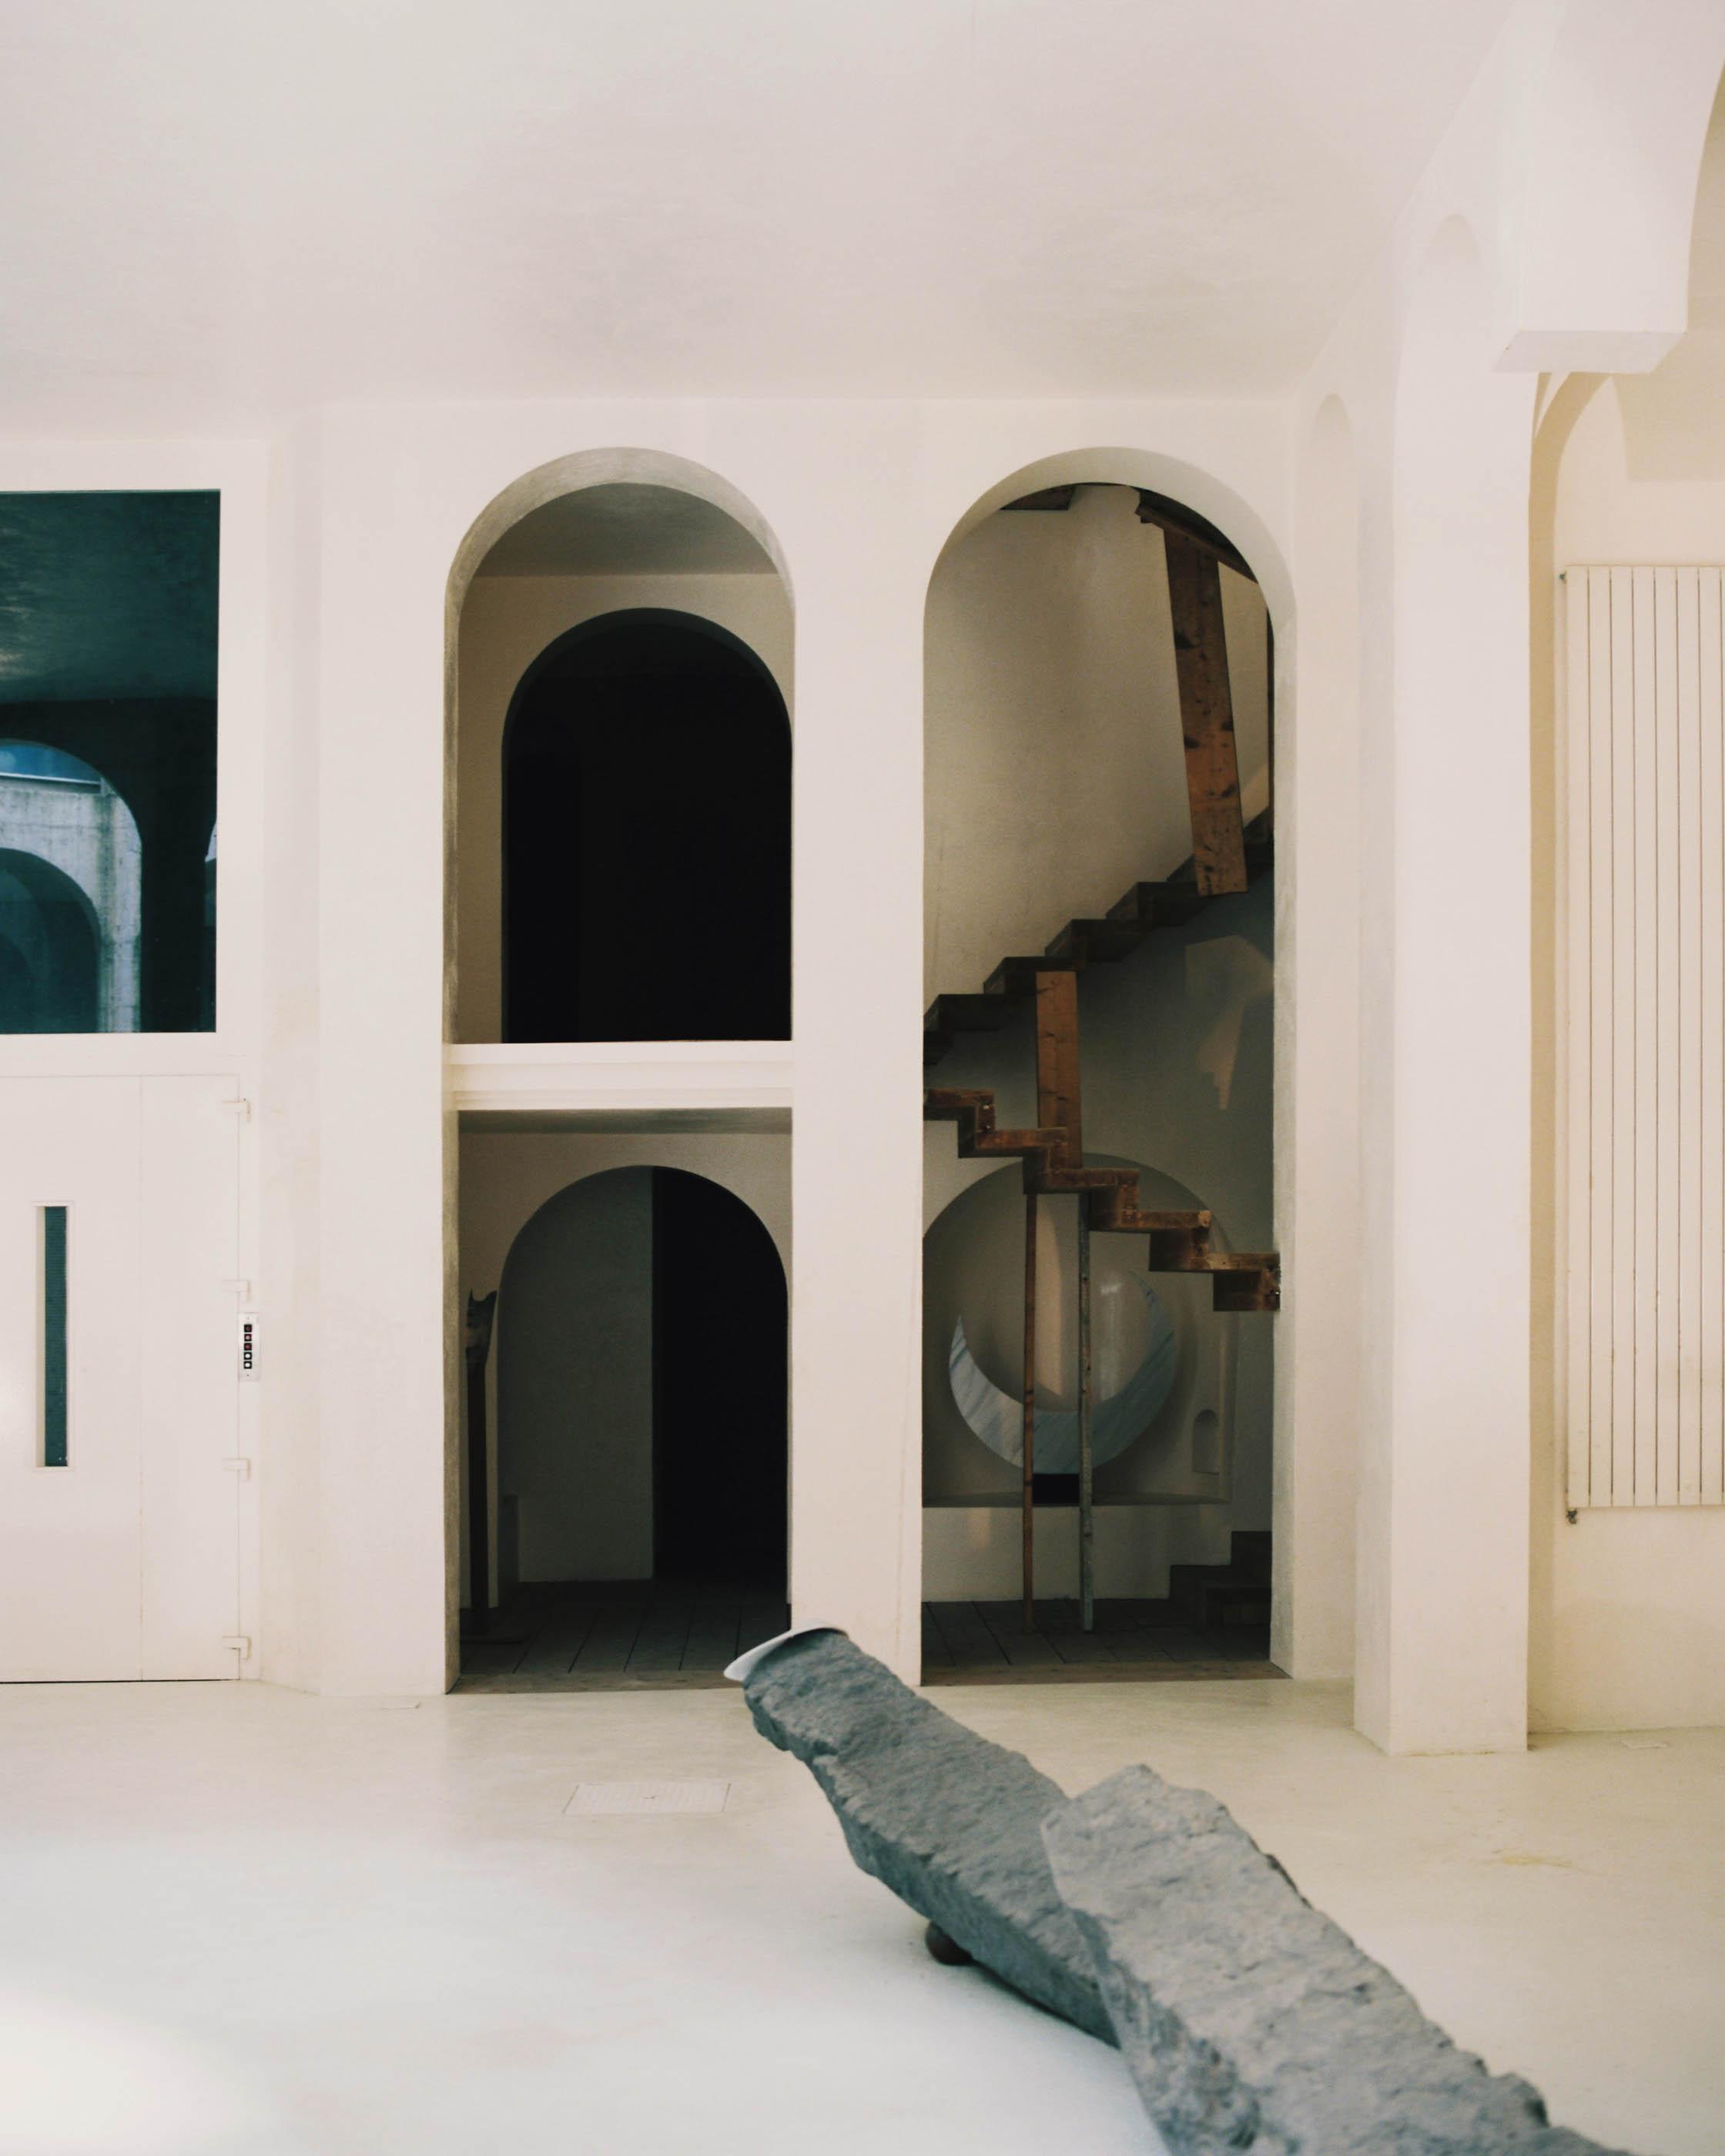 #editorial #xavier #corbero #barcelona #architecture #wallstreetjournal #interiors